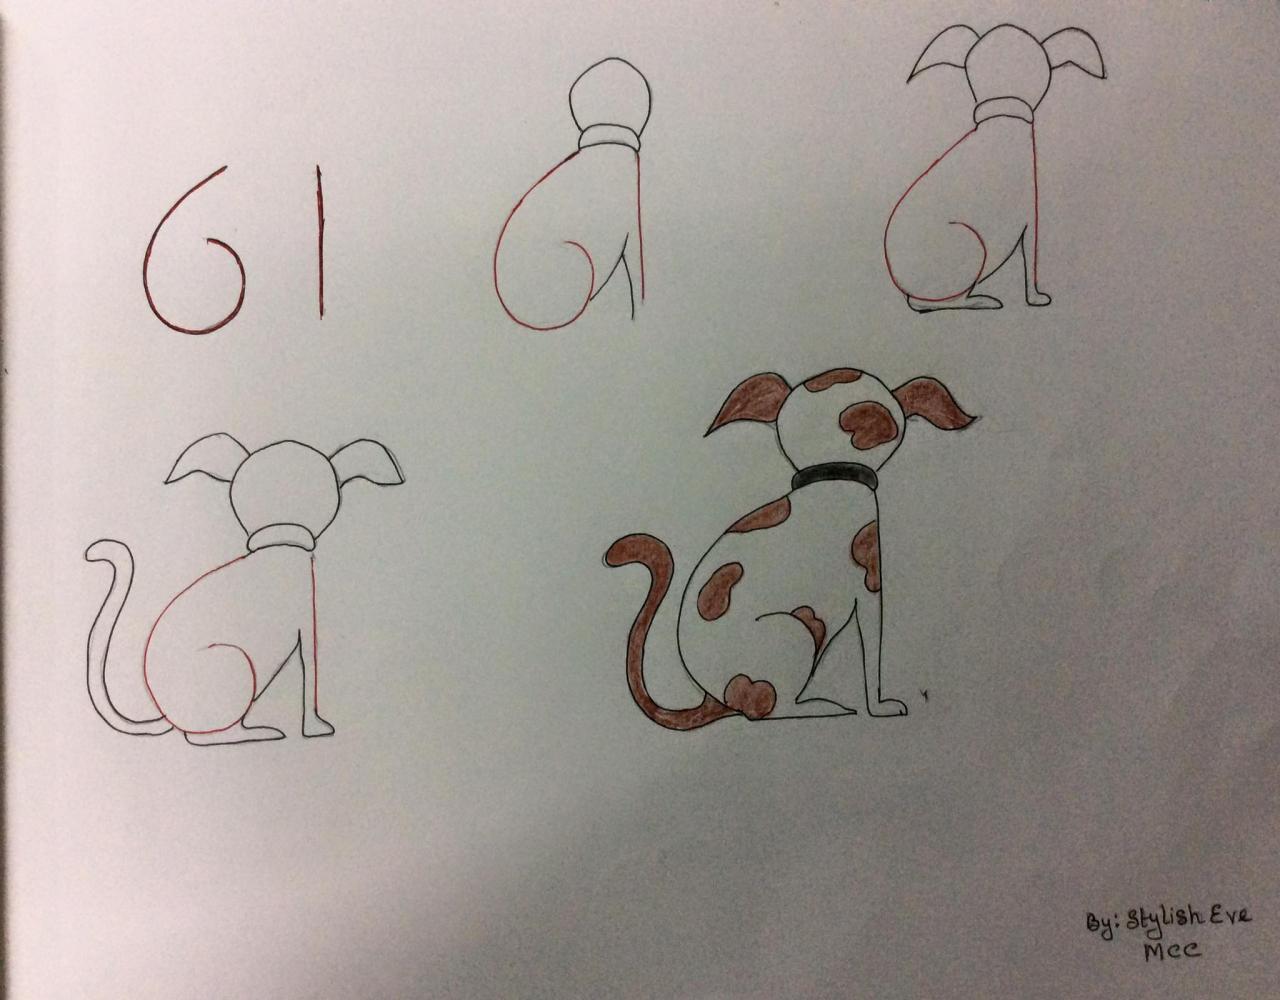 Enseña a los más peques a dibujar a partir de números y letras, dibujos de A Partir De Letras, como dibujar A Partir De Letras paso a paso